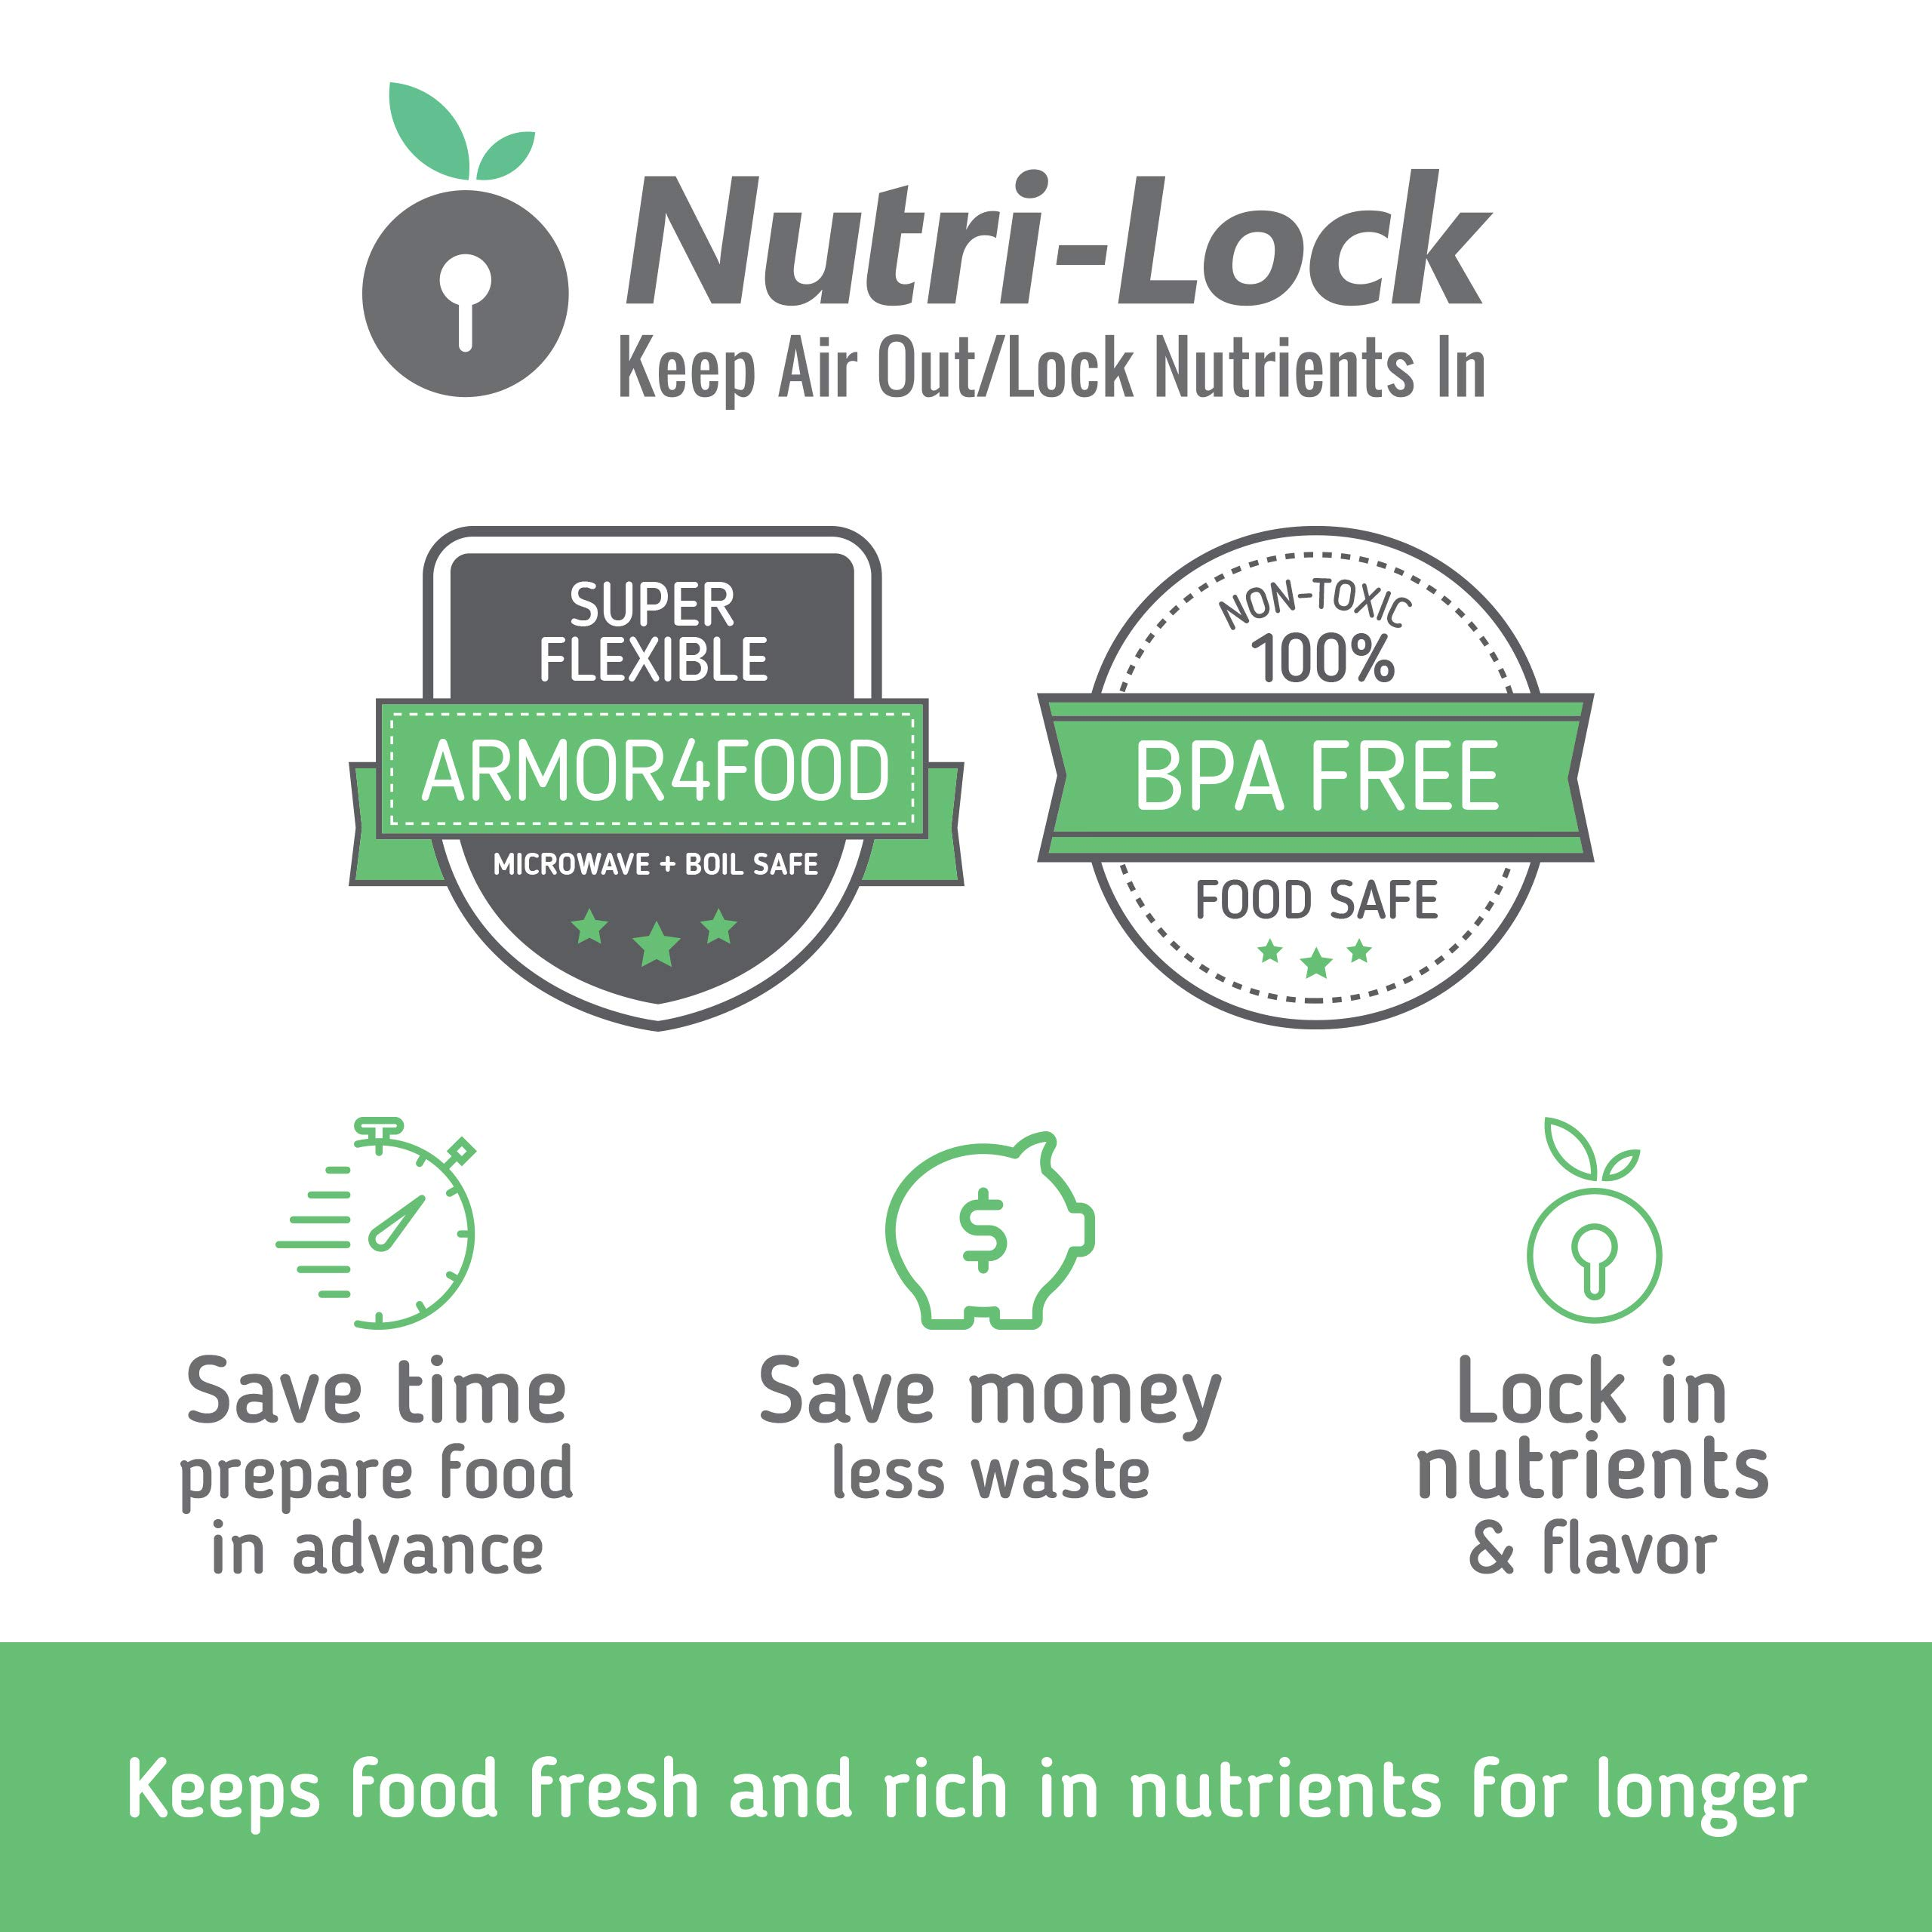 Nutri-Lock Vacuum Sealer Bags. 100 Quart Bags 8x12 Inch. Commercial Grade Food Sealer Bags for FoodSaver, Sous Vide by Nutri-Lock